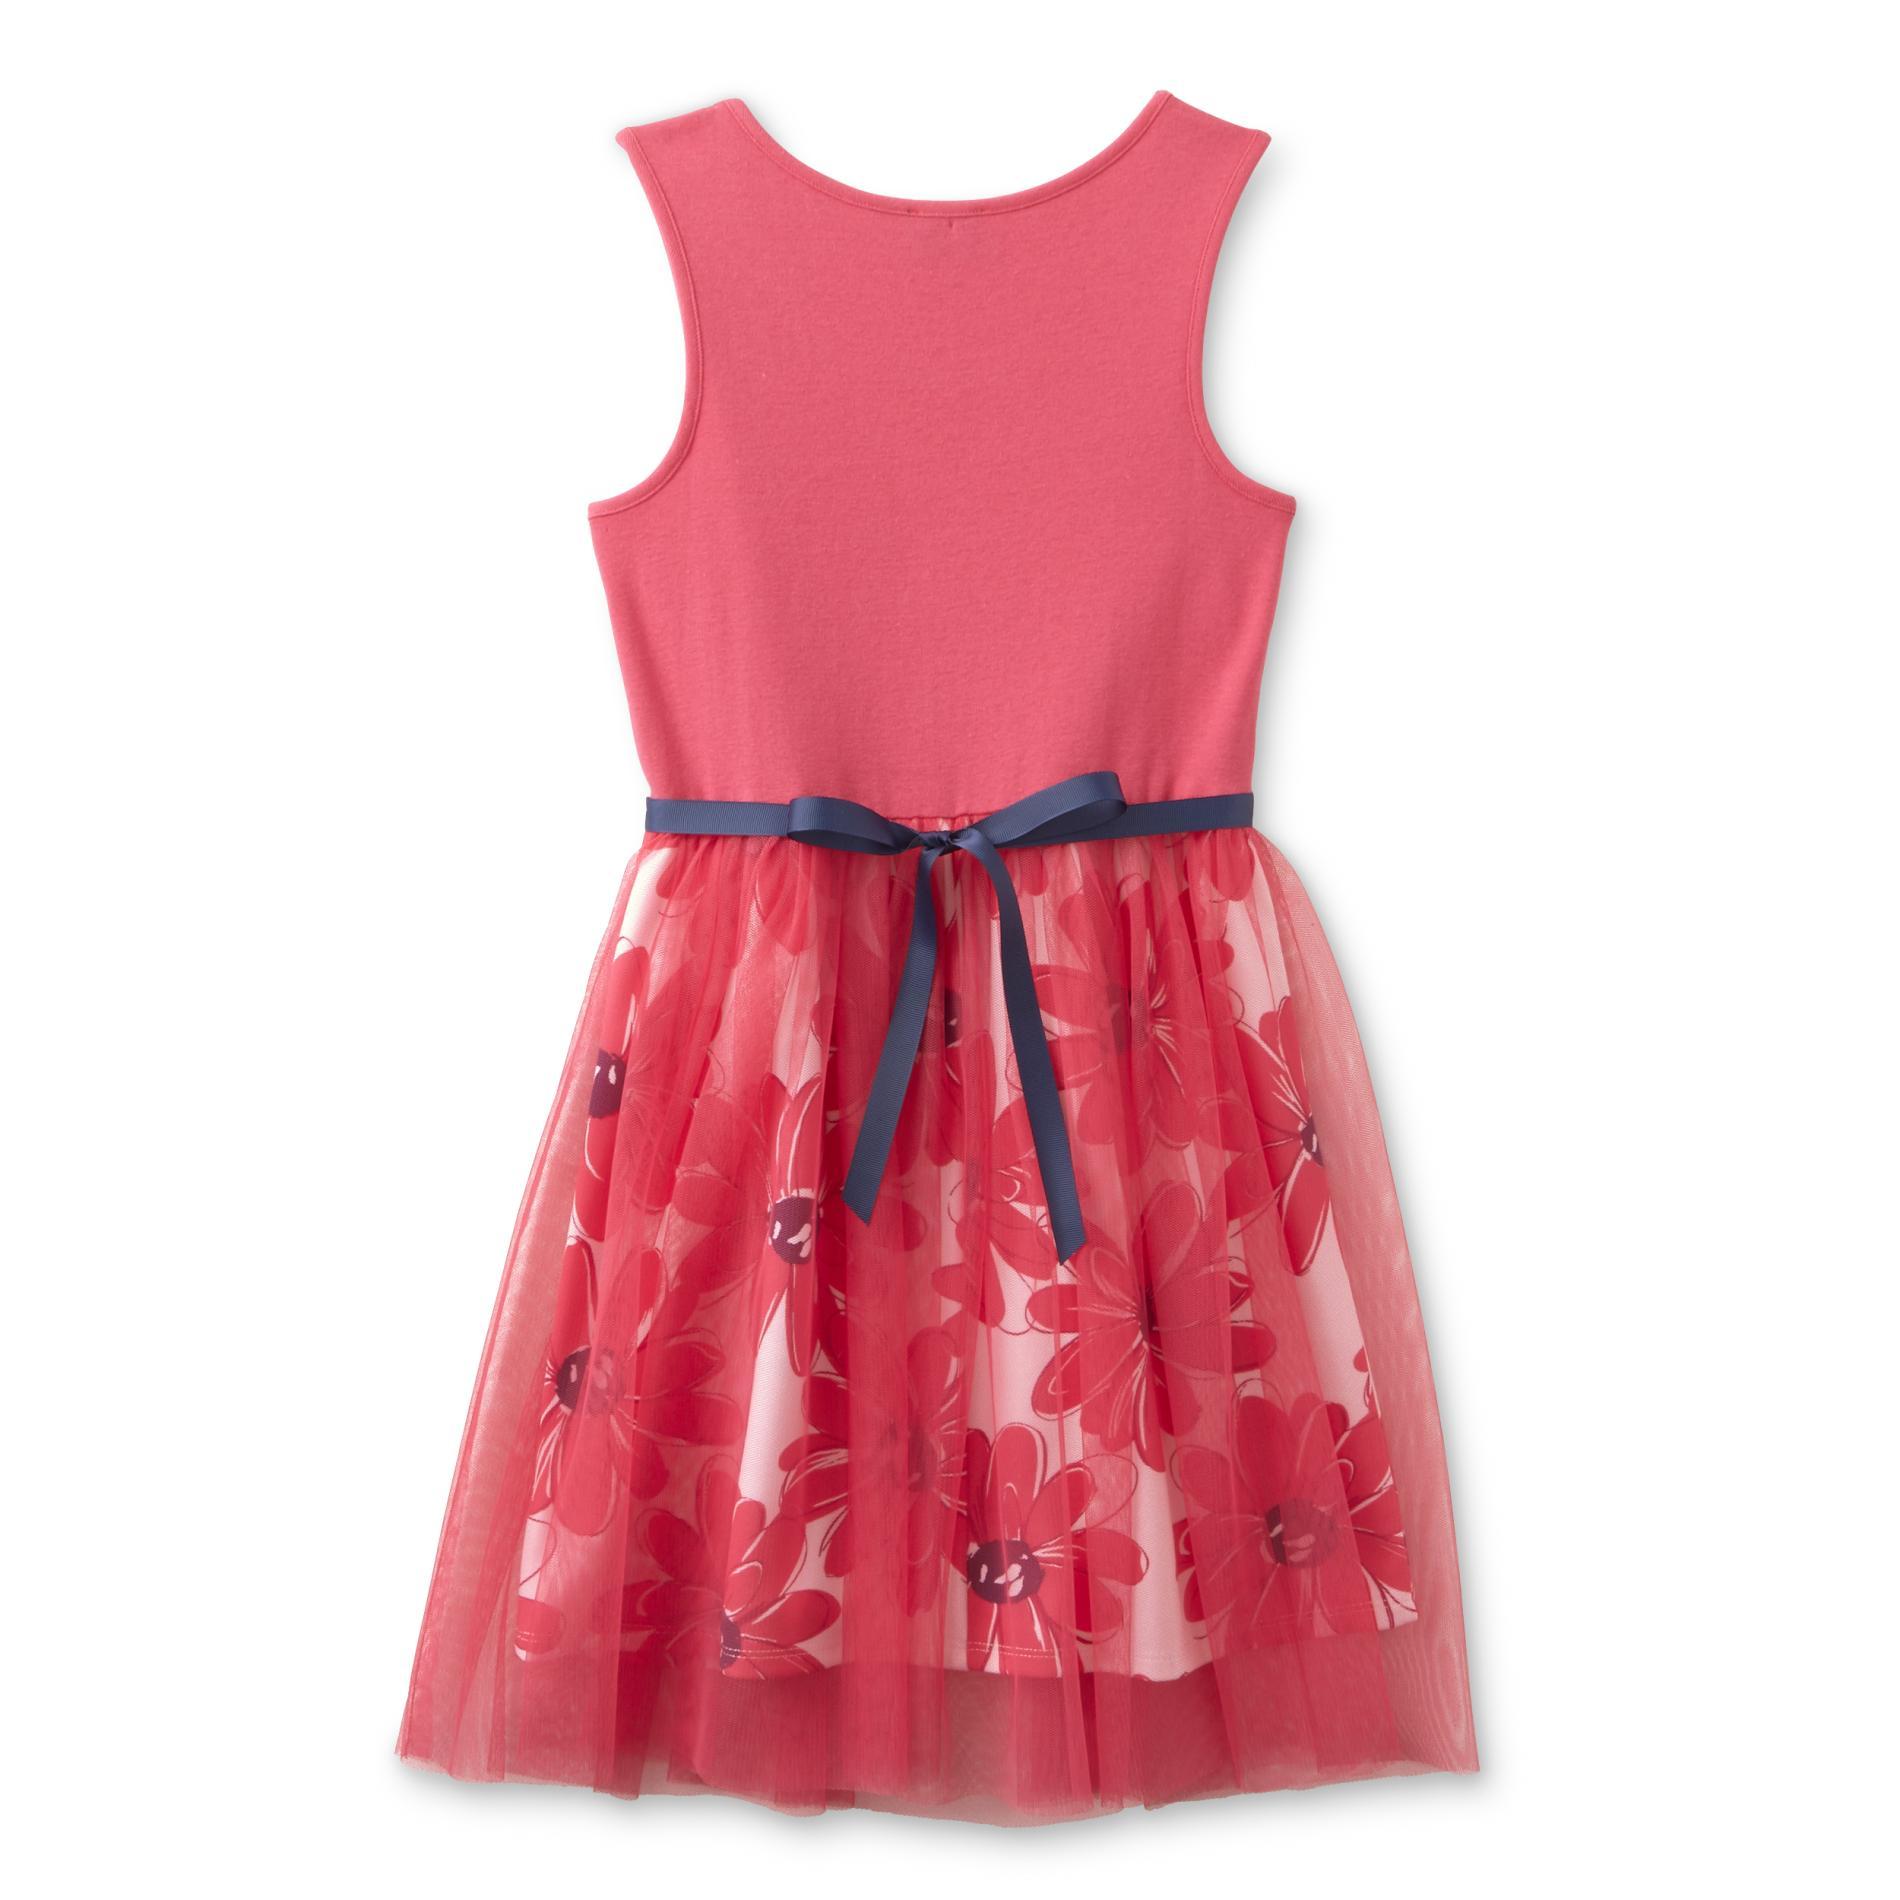 Lilt Girl's Sleeveless Dress - Floral Print